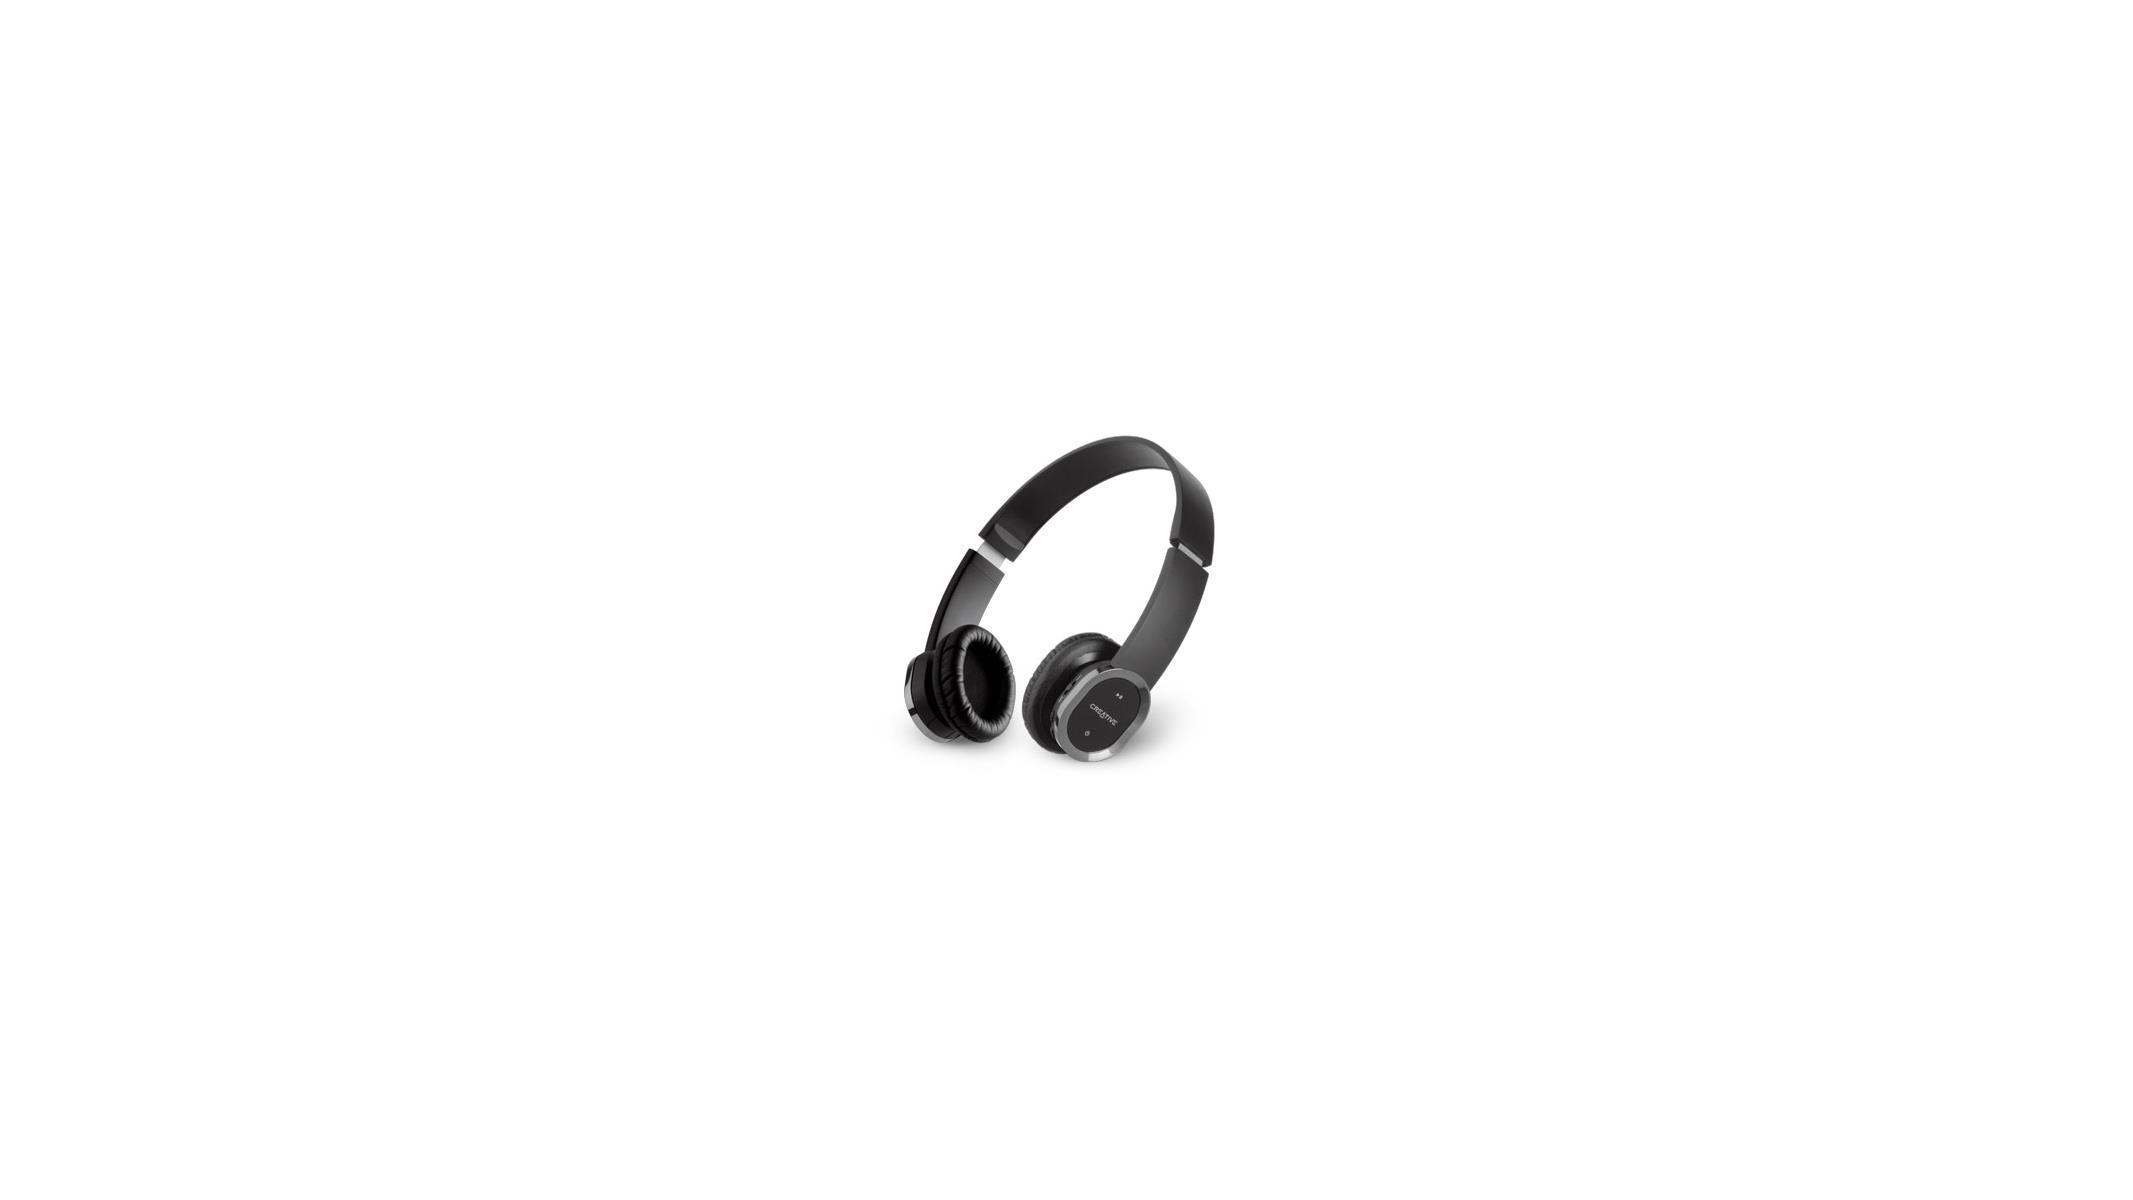 7099a6598b7 Creative Intros WP-450, Creative WP-350 And Creative WP-250 BT Headphones    HotHardware